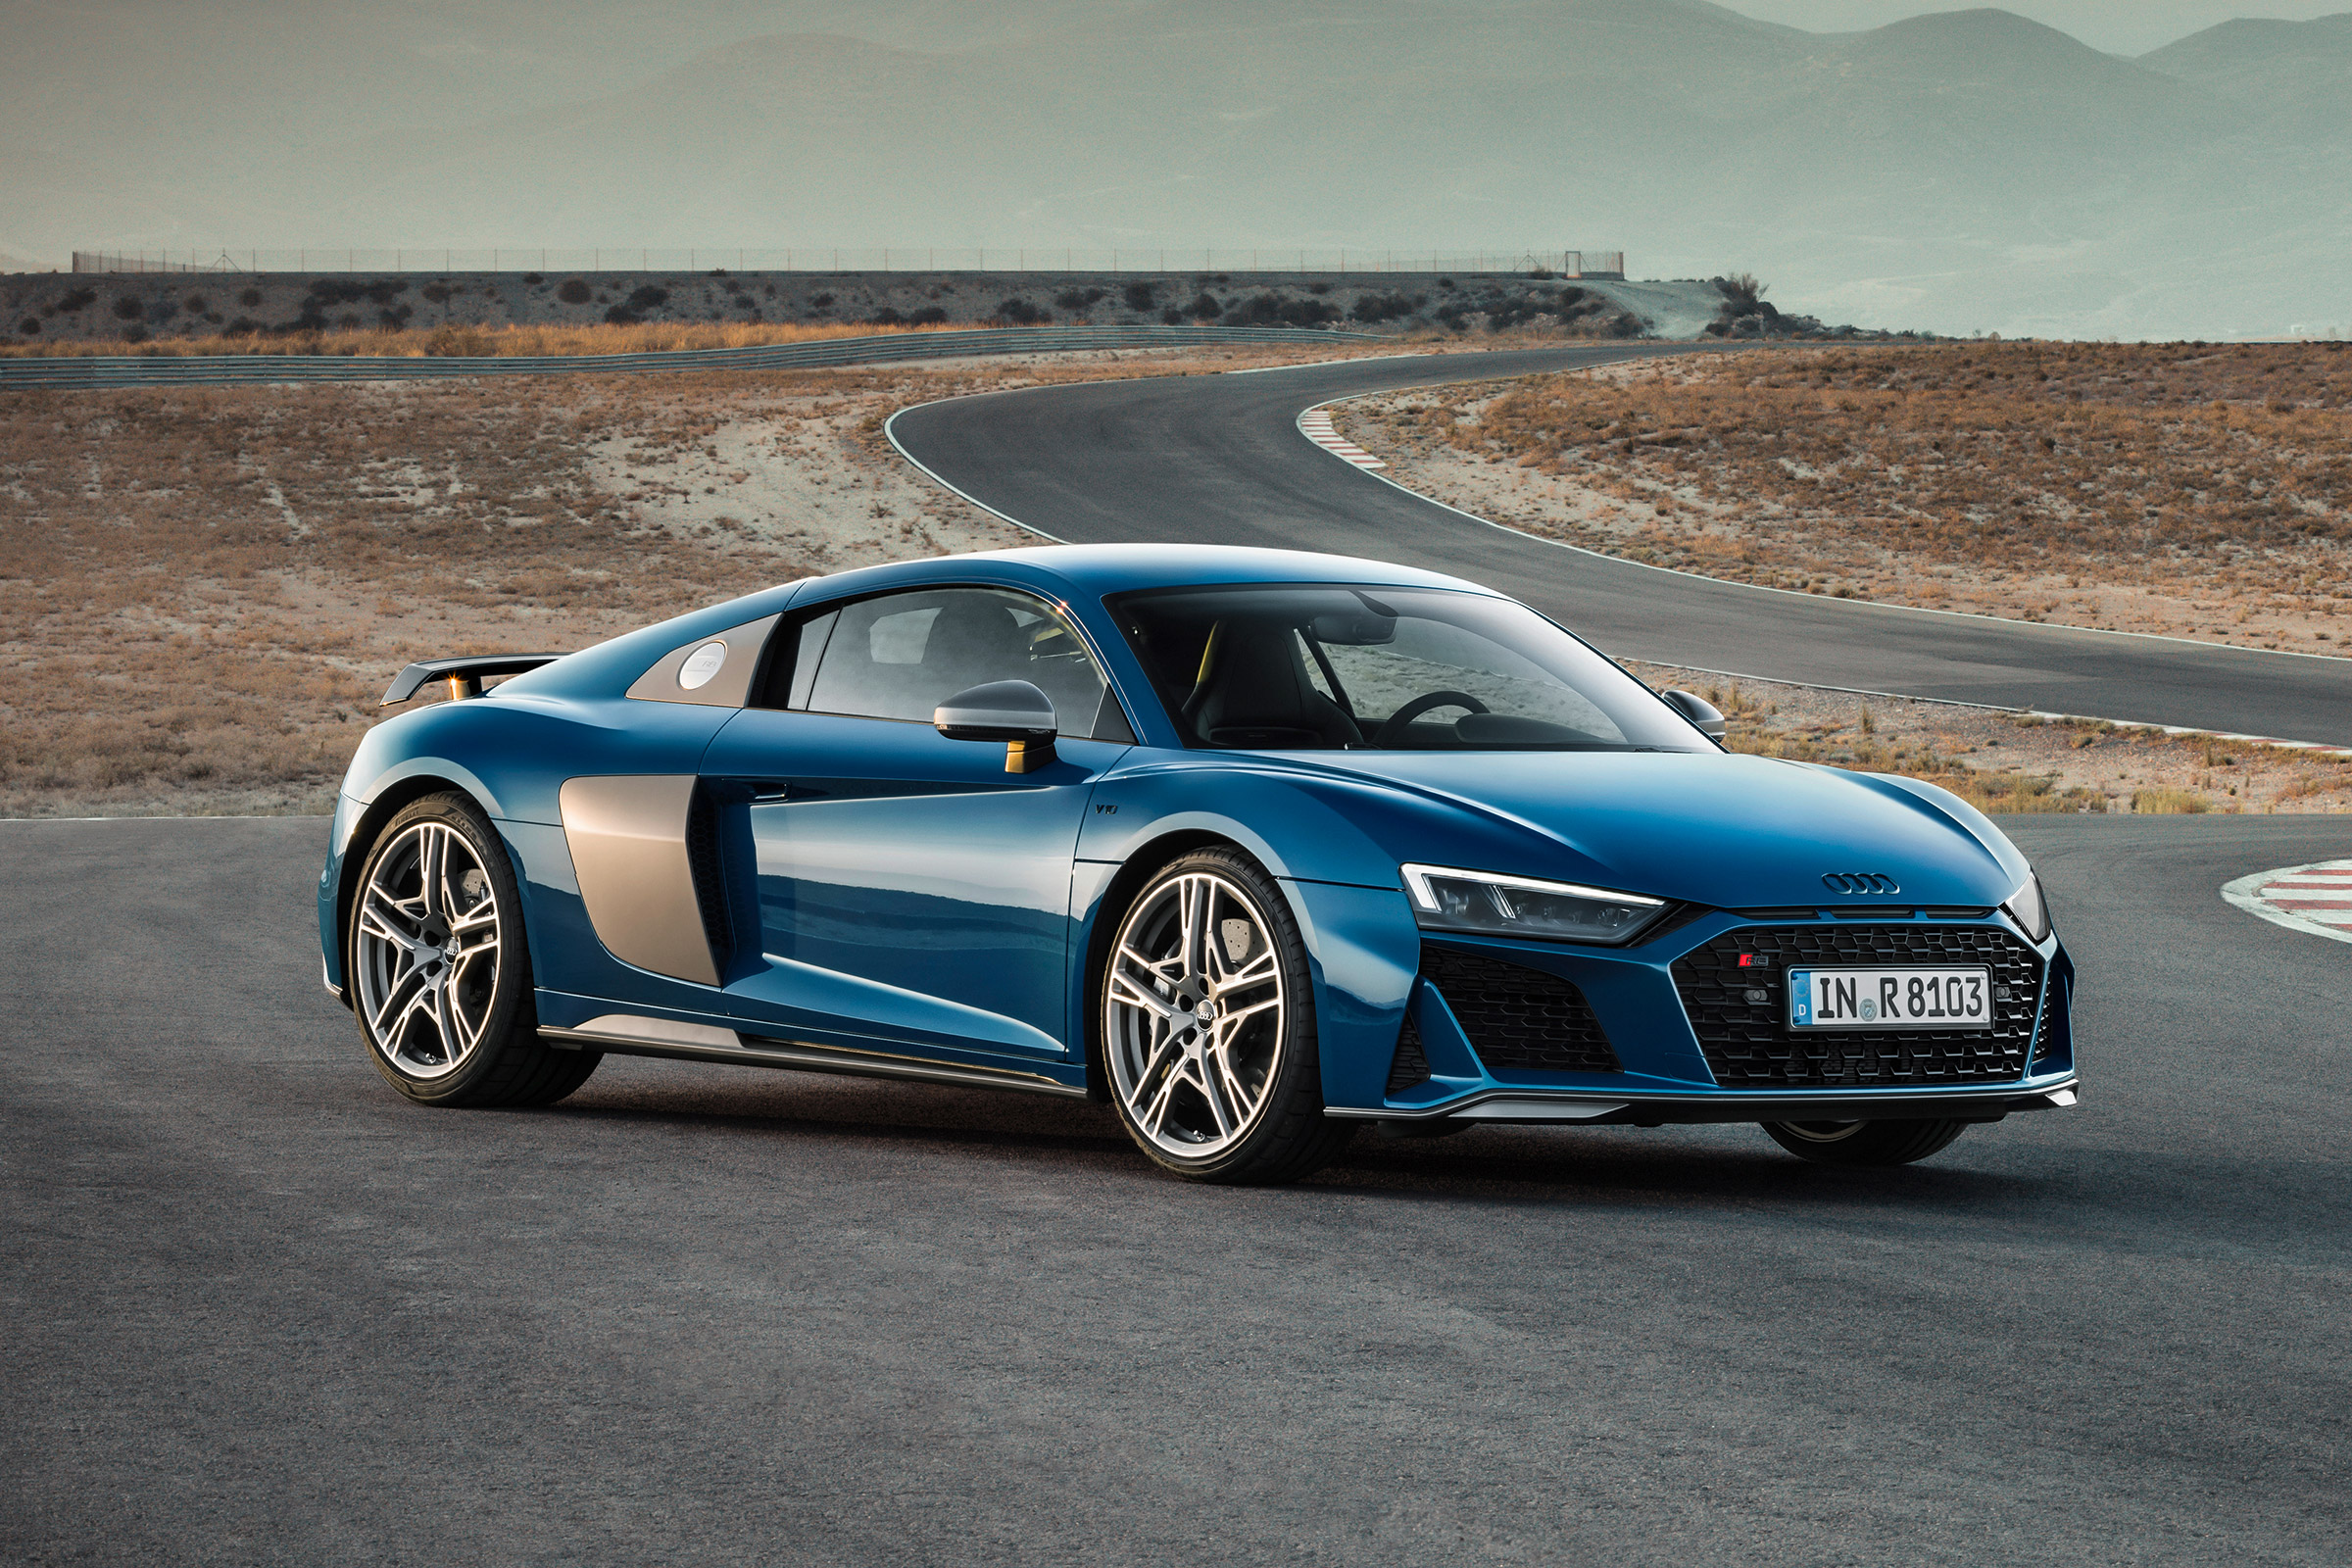 New Audi R8 revealed: More performance, more precision | Evo